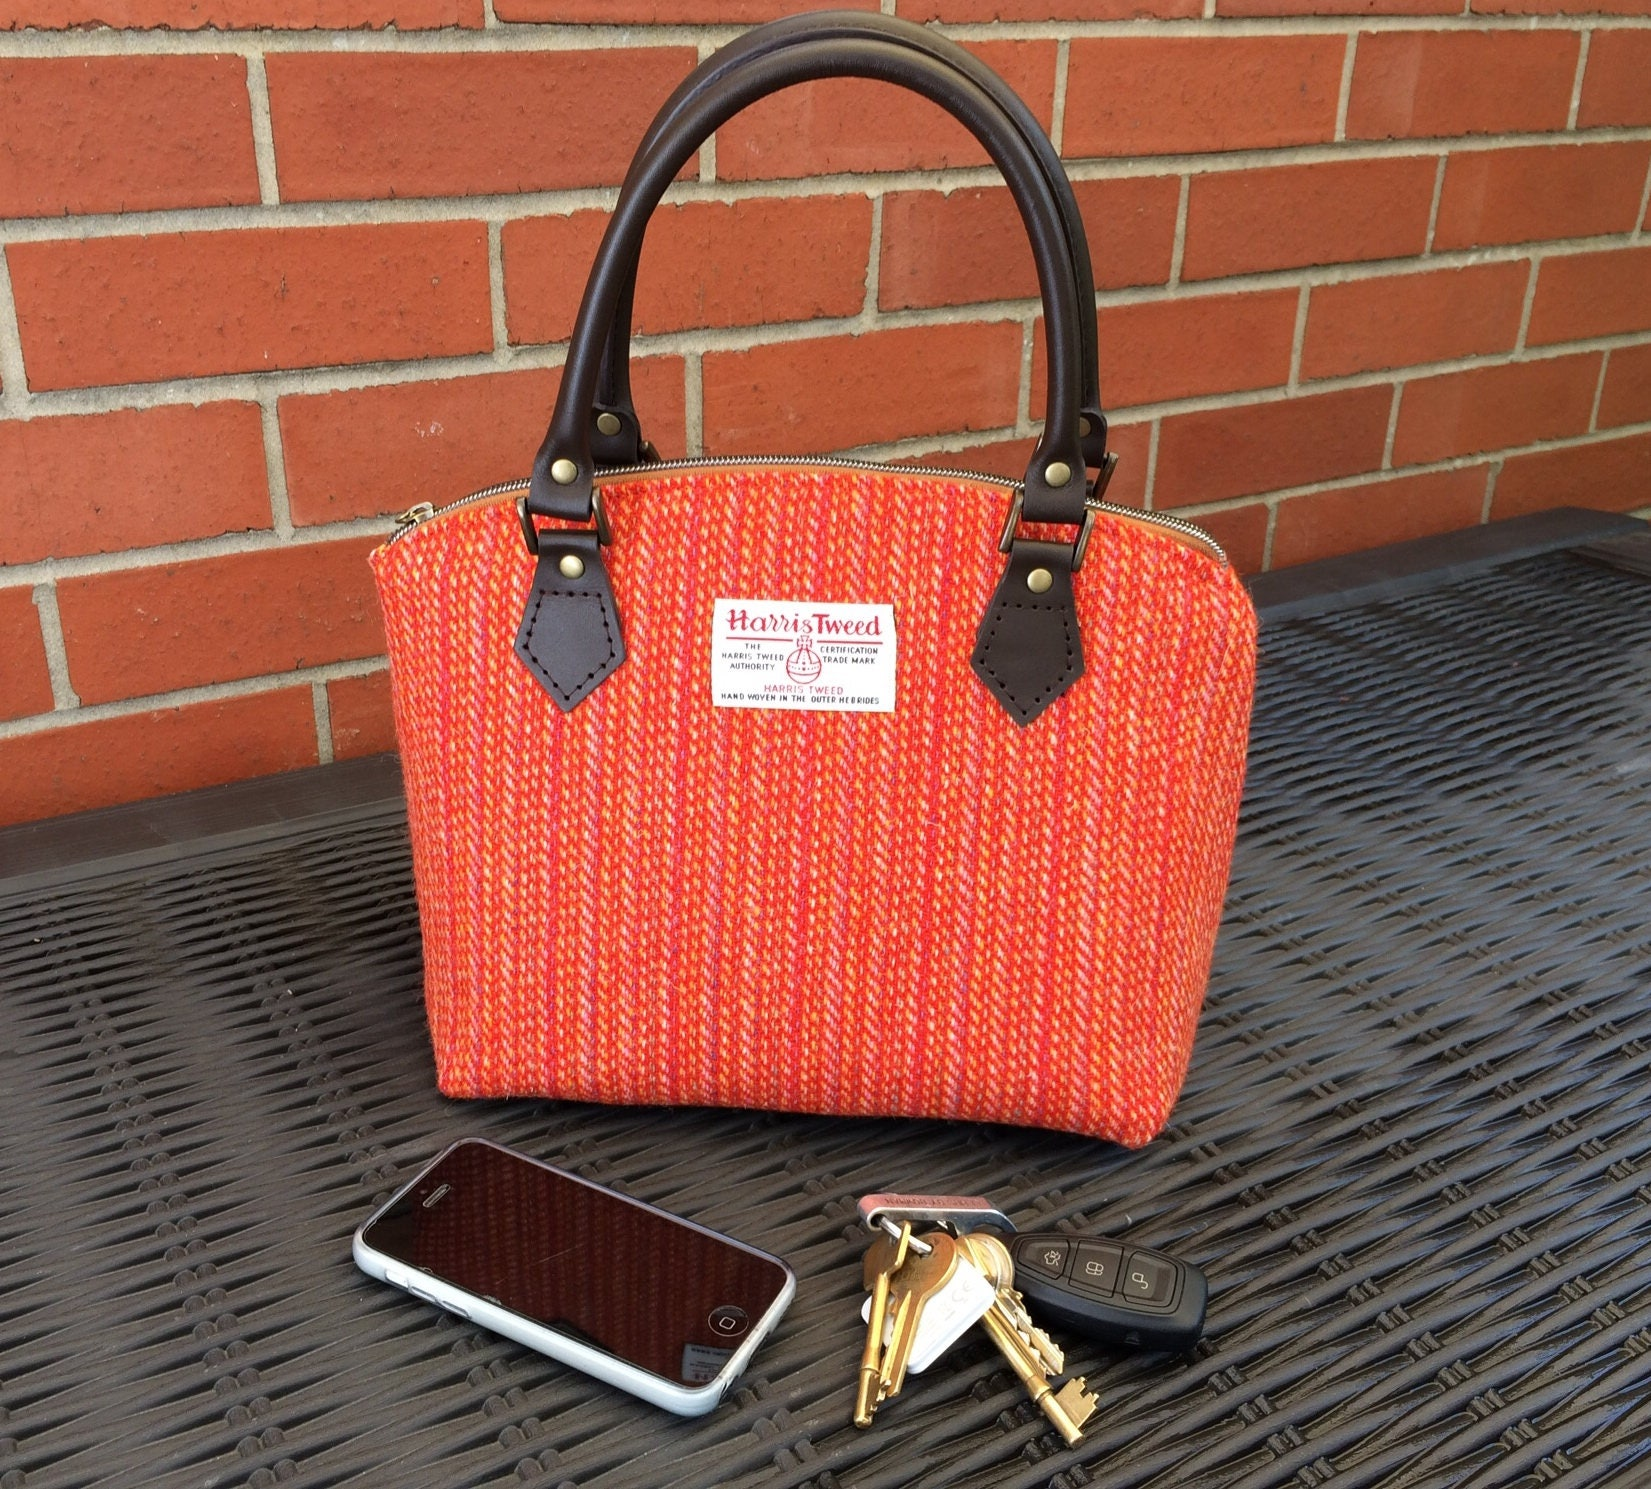 Harris Tweed handbag   ladies handbag  ladies purse  wool handbag  gift for mum  wool Anniversary gift  orange handbag  Swoon Lola